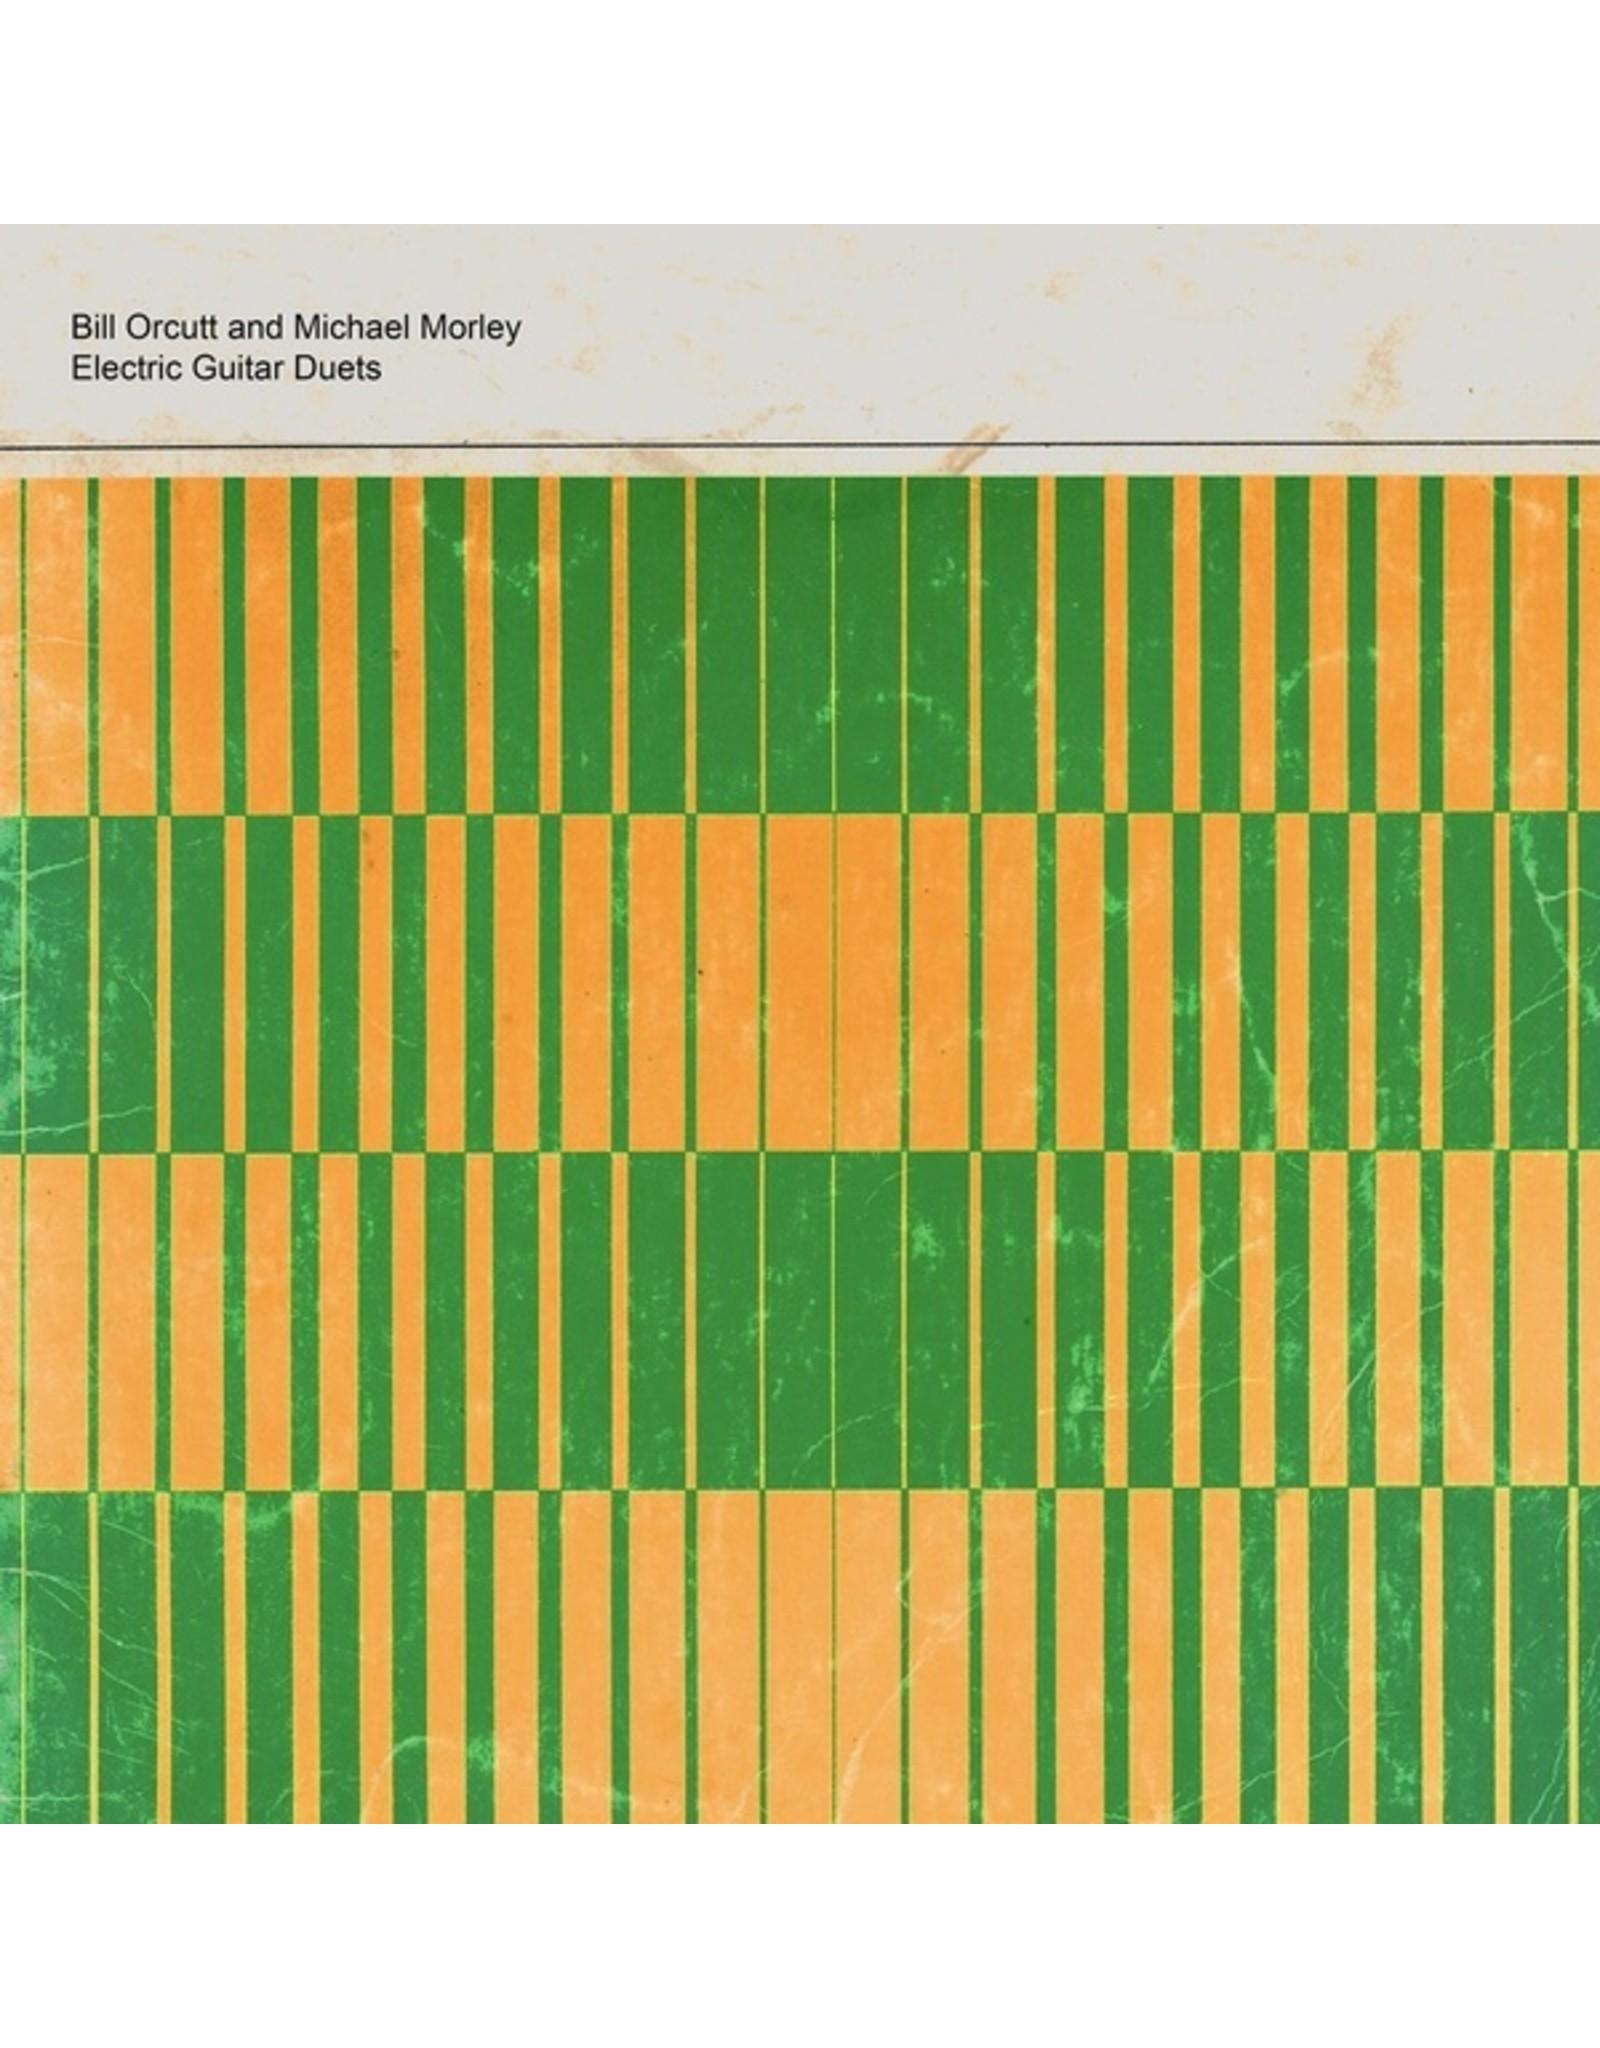 New Vinyl Bill Orcutt & Michael Morley - Electric Guitar Duets LP